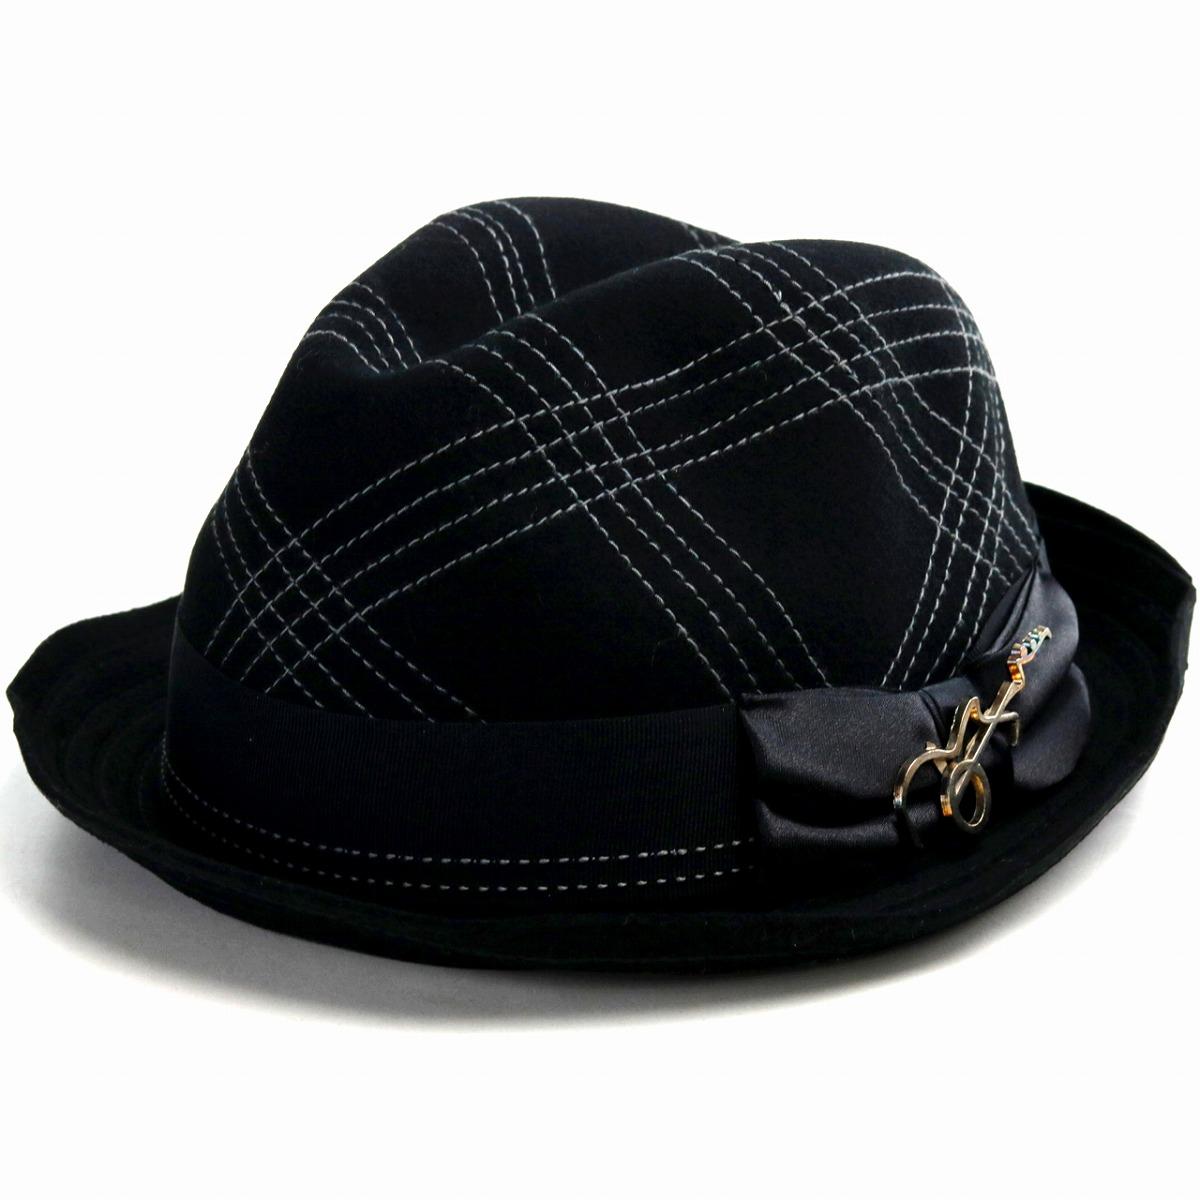 e8b36bb451b Carlos Santana men hat hat wool hat CARLOS SANTANA felt hat check soft ...